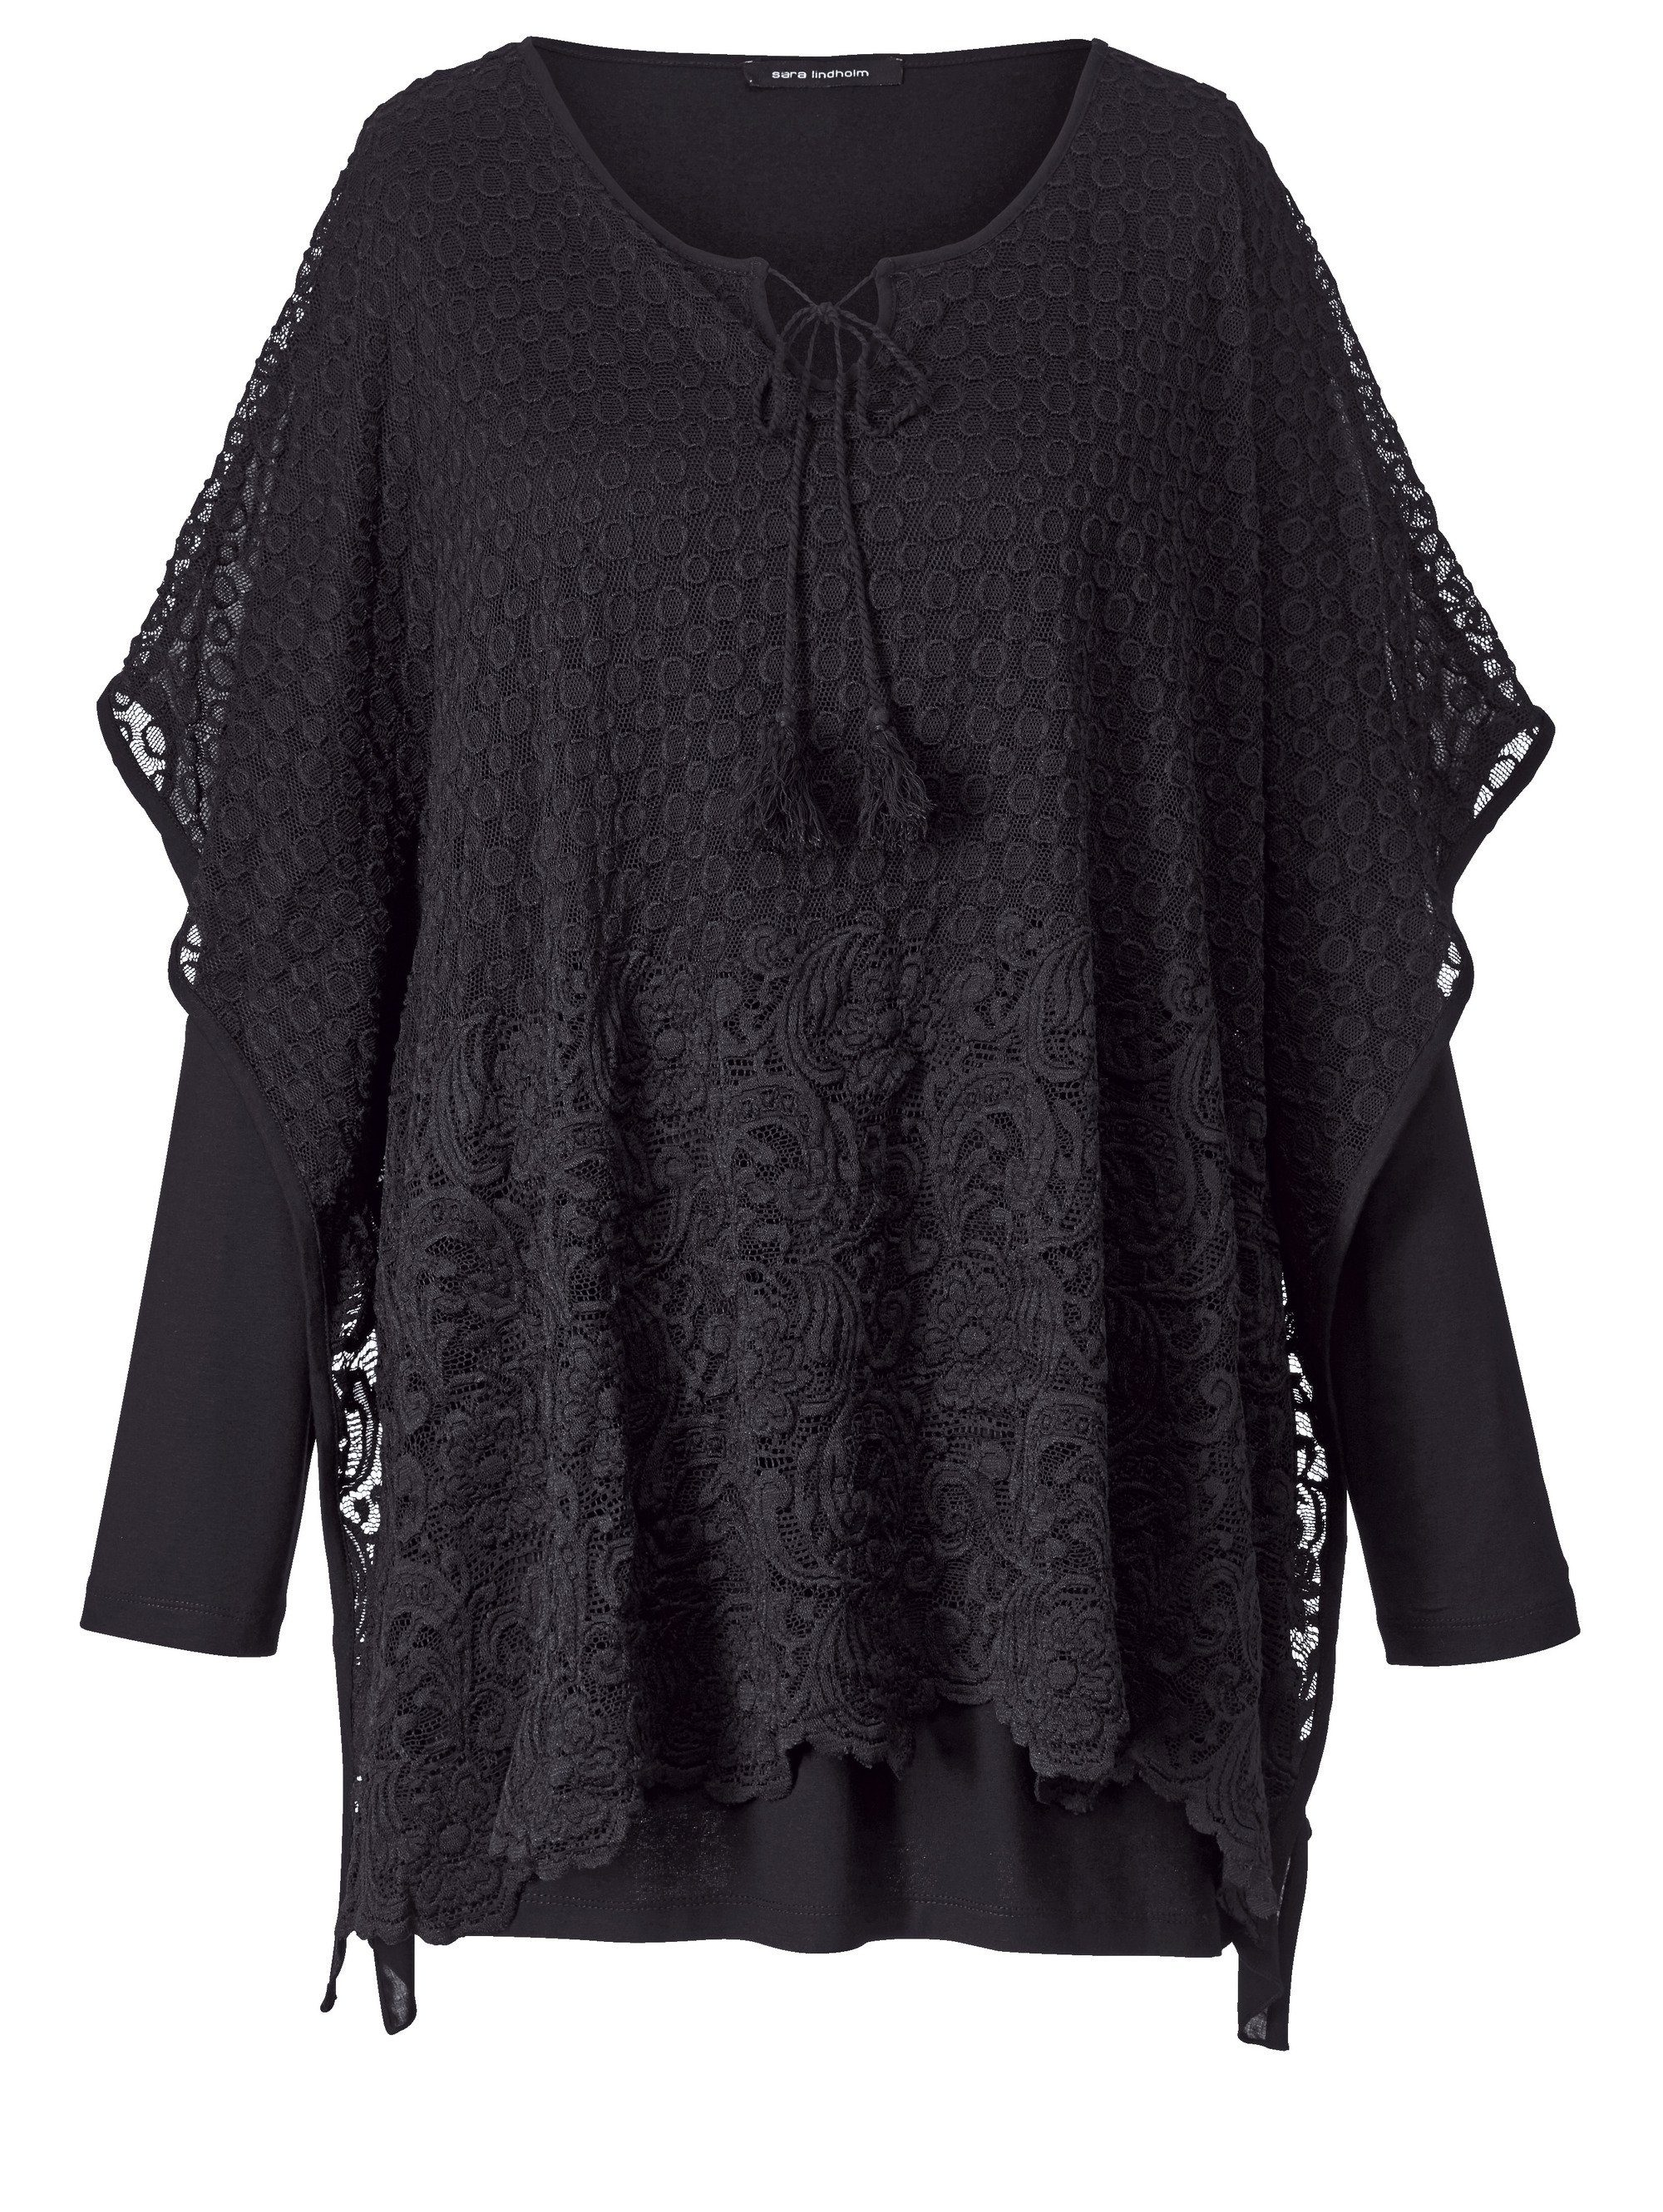 Sara Lindholm by Happy Size 2-in-1-Shirt mit Spitze